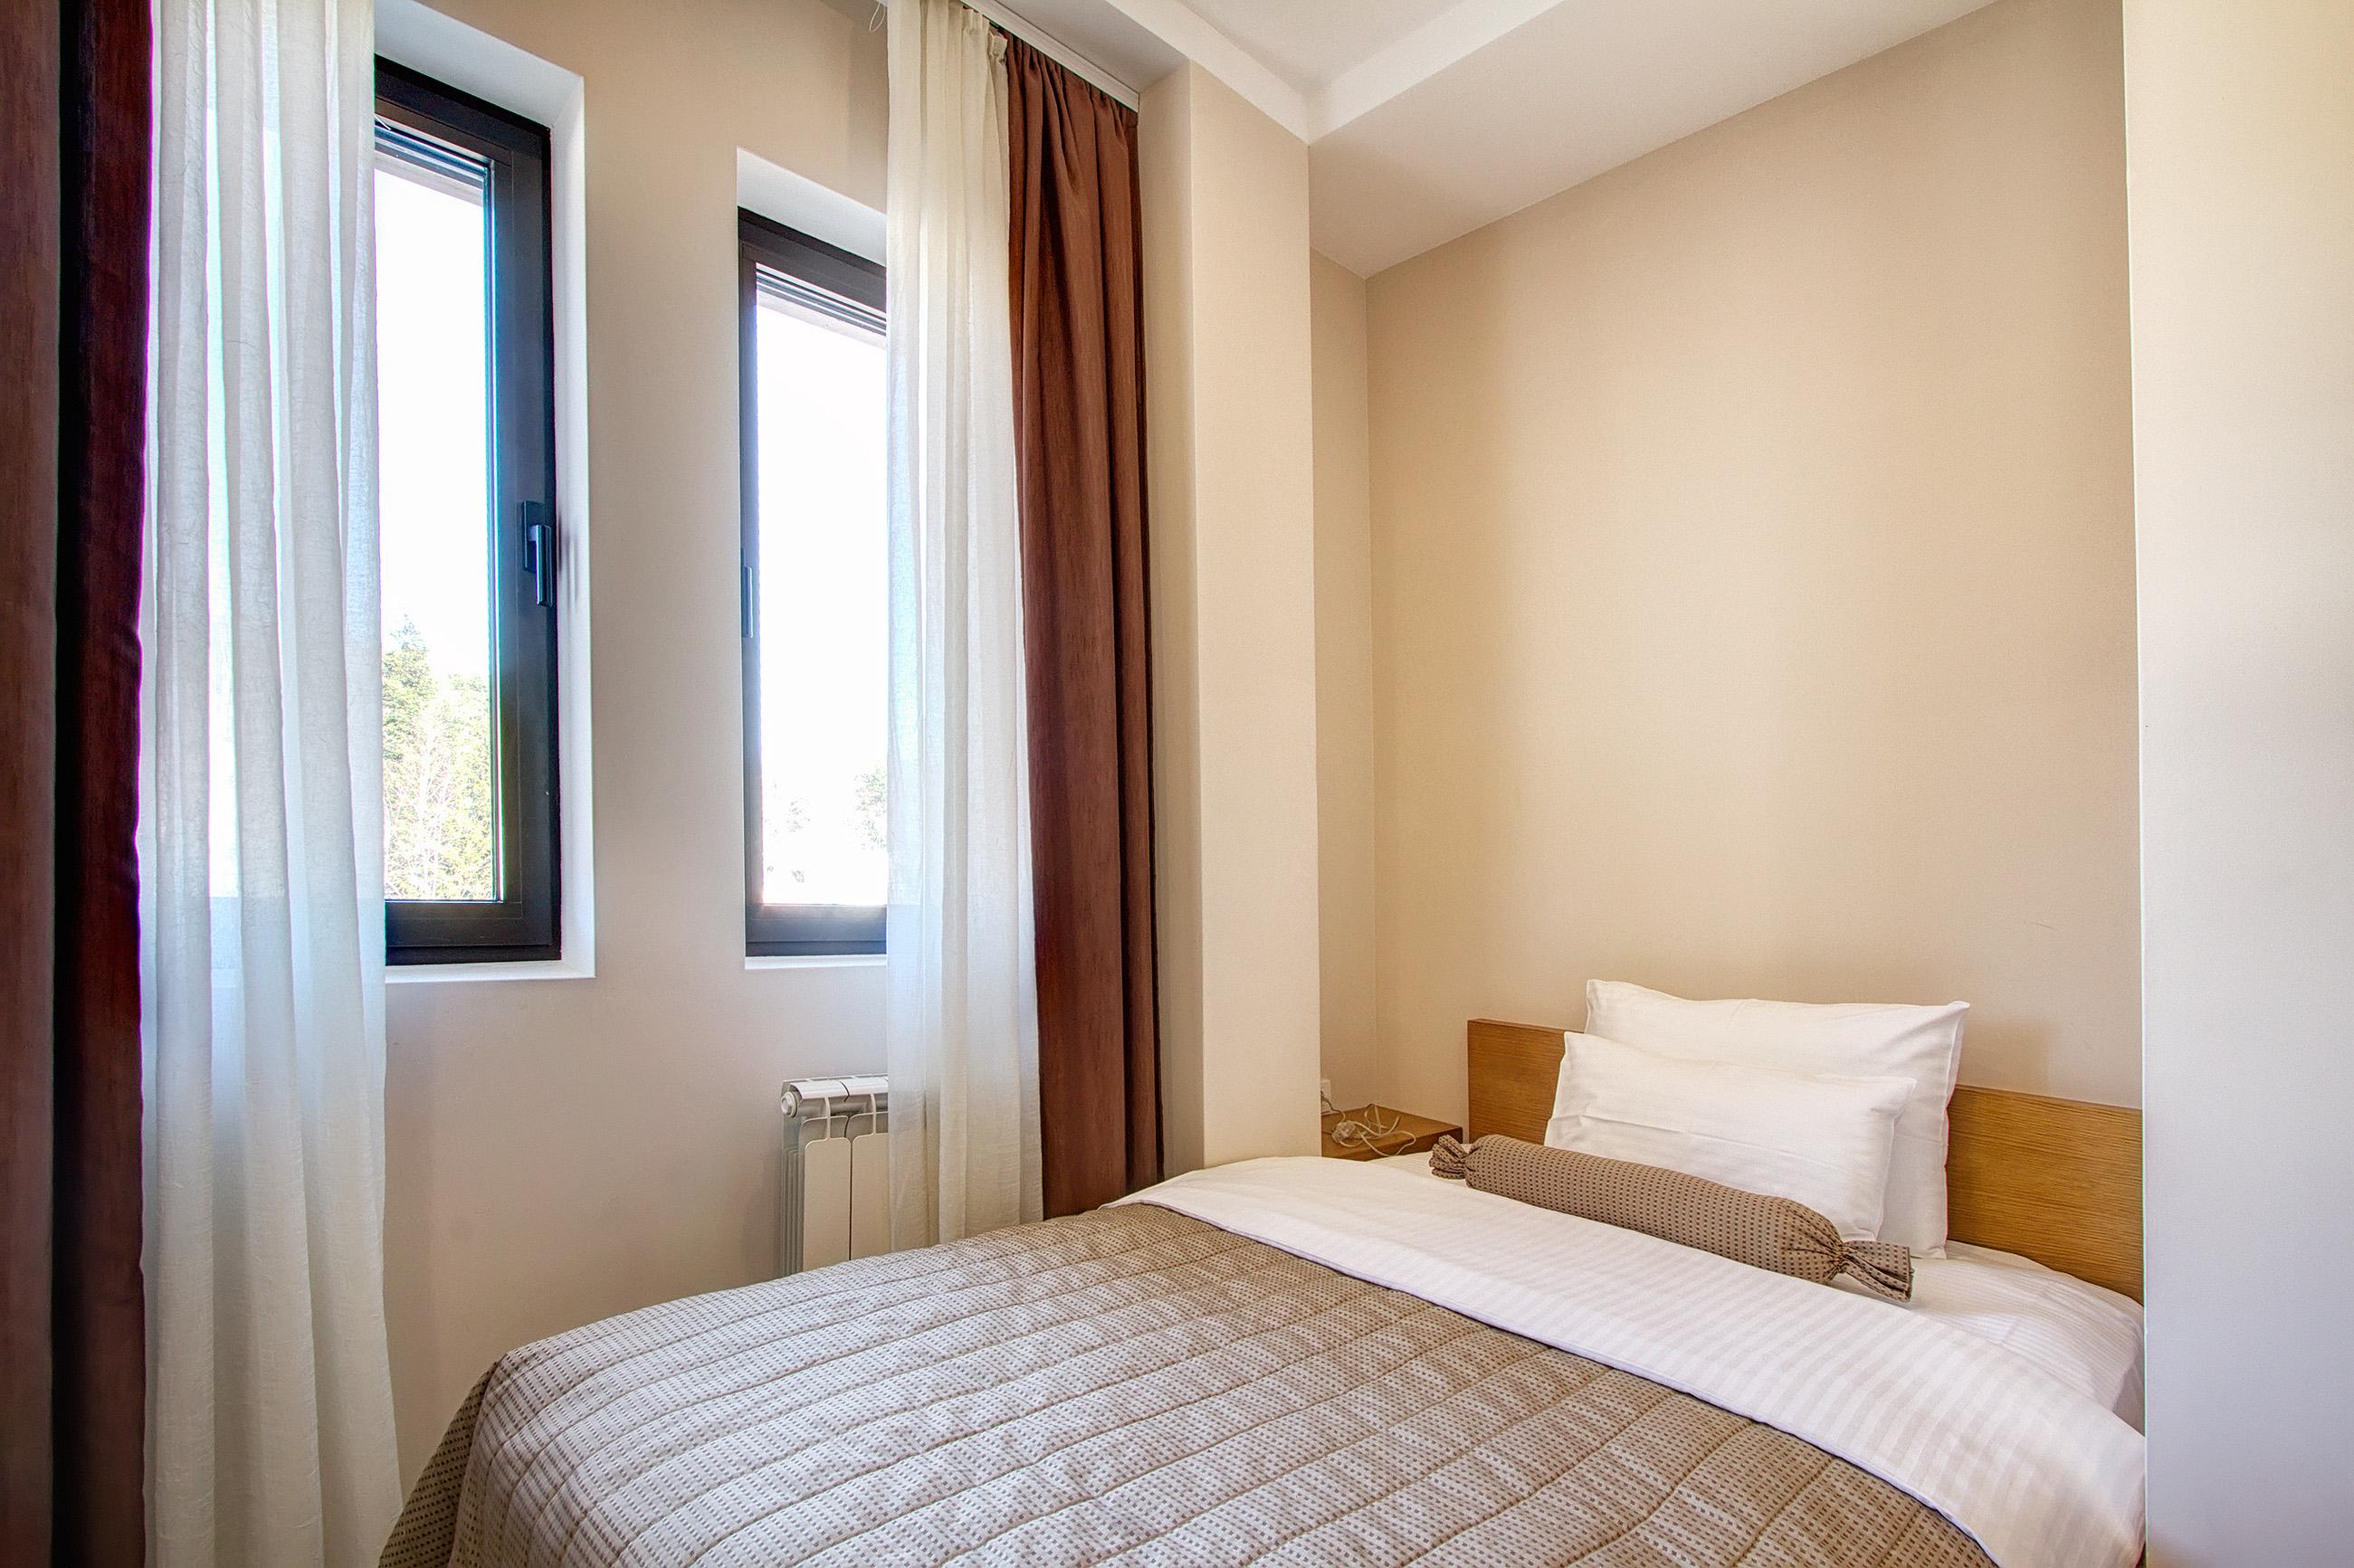 Zlatibor, smestaj, letnji odmor, spavanje, pansion, spa, soba, apartman, akcija, nova godina, hotel mir 15